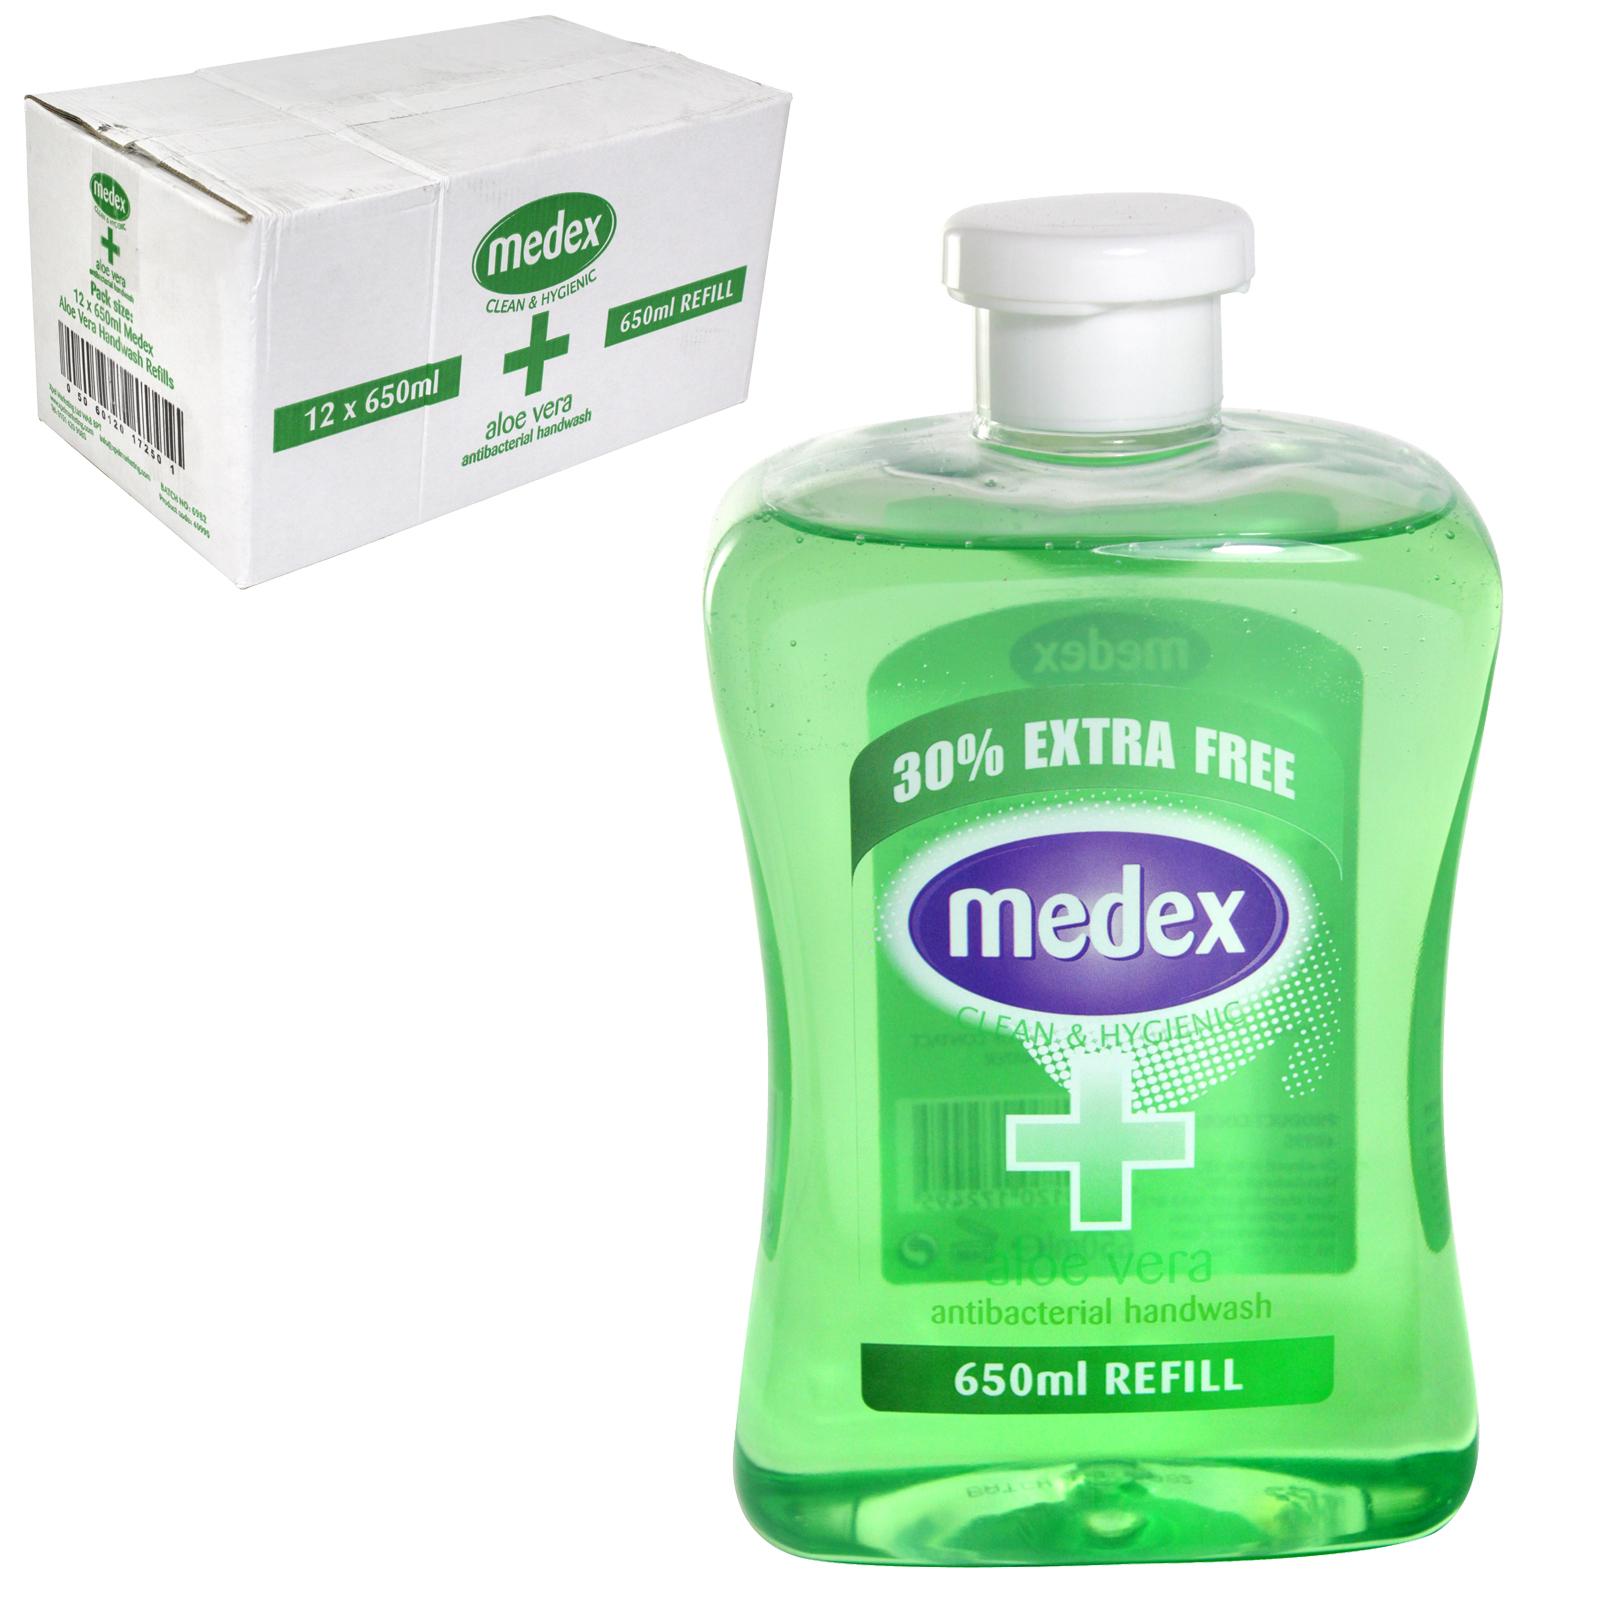 MEDEX ANTI-BAC HAND WASH FLIP CAP 650ML ALOE VERA X12